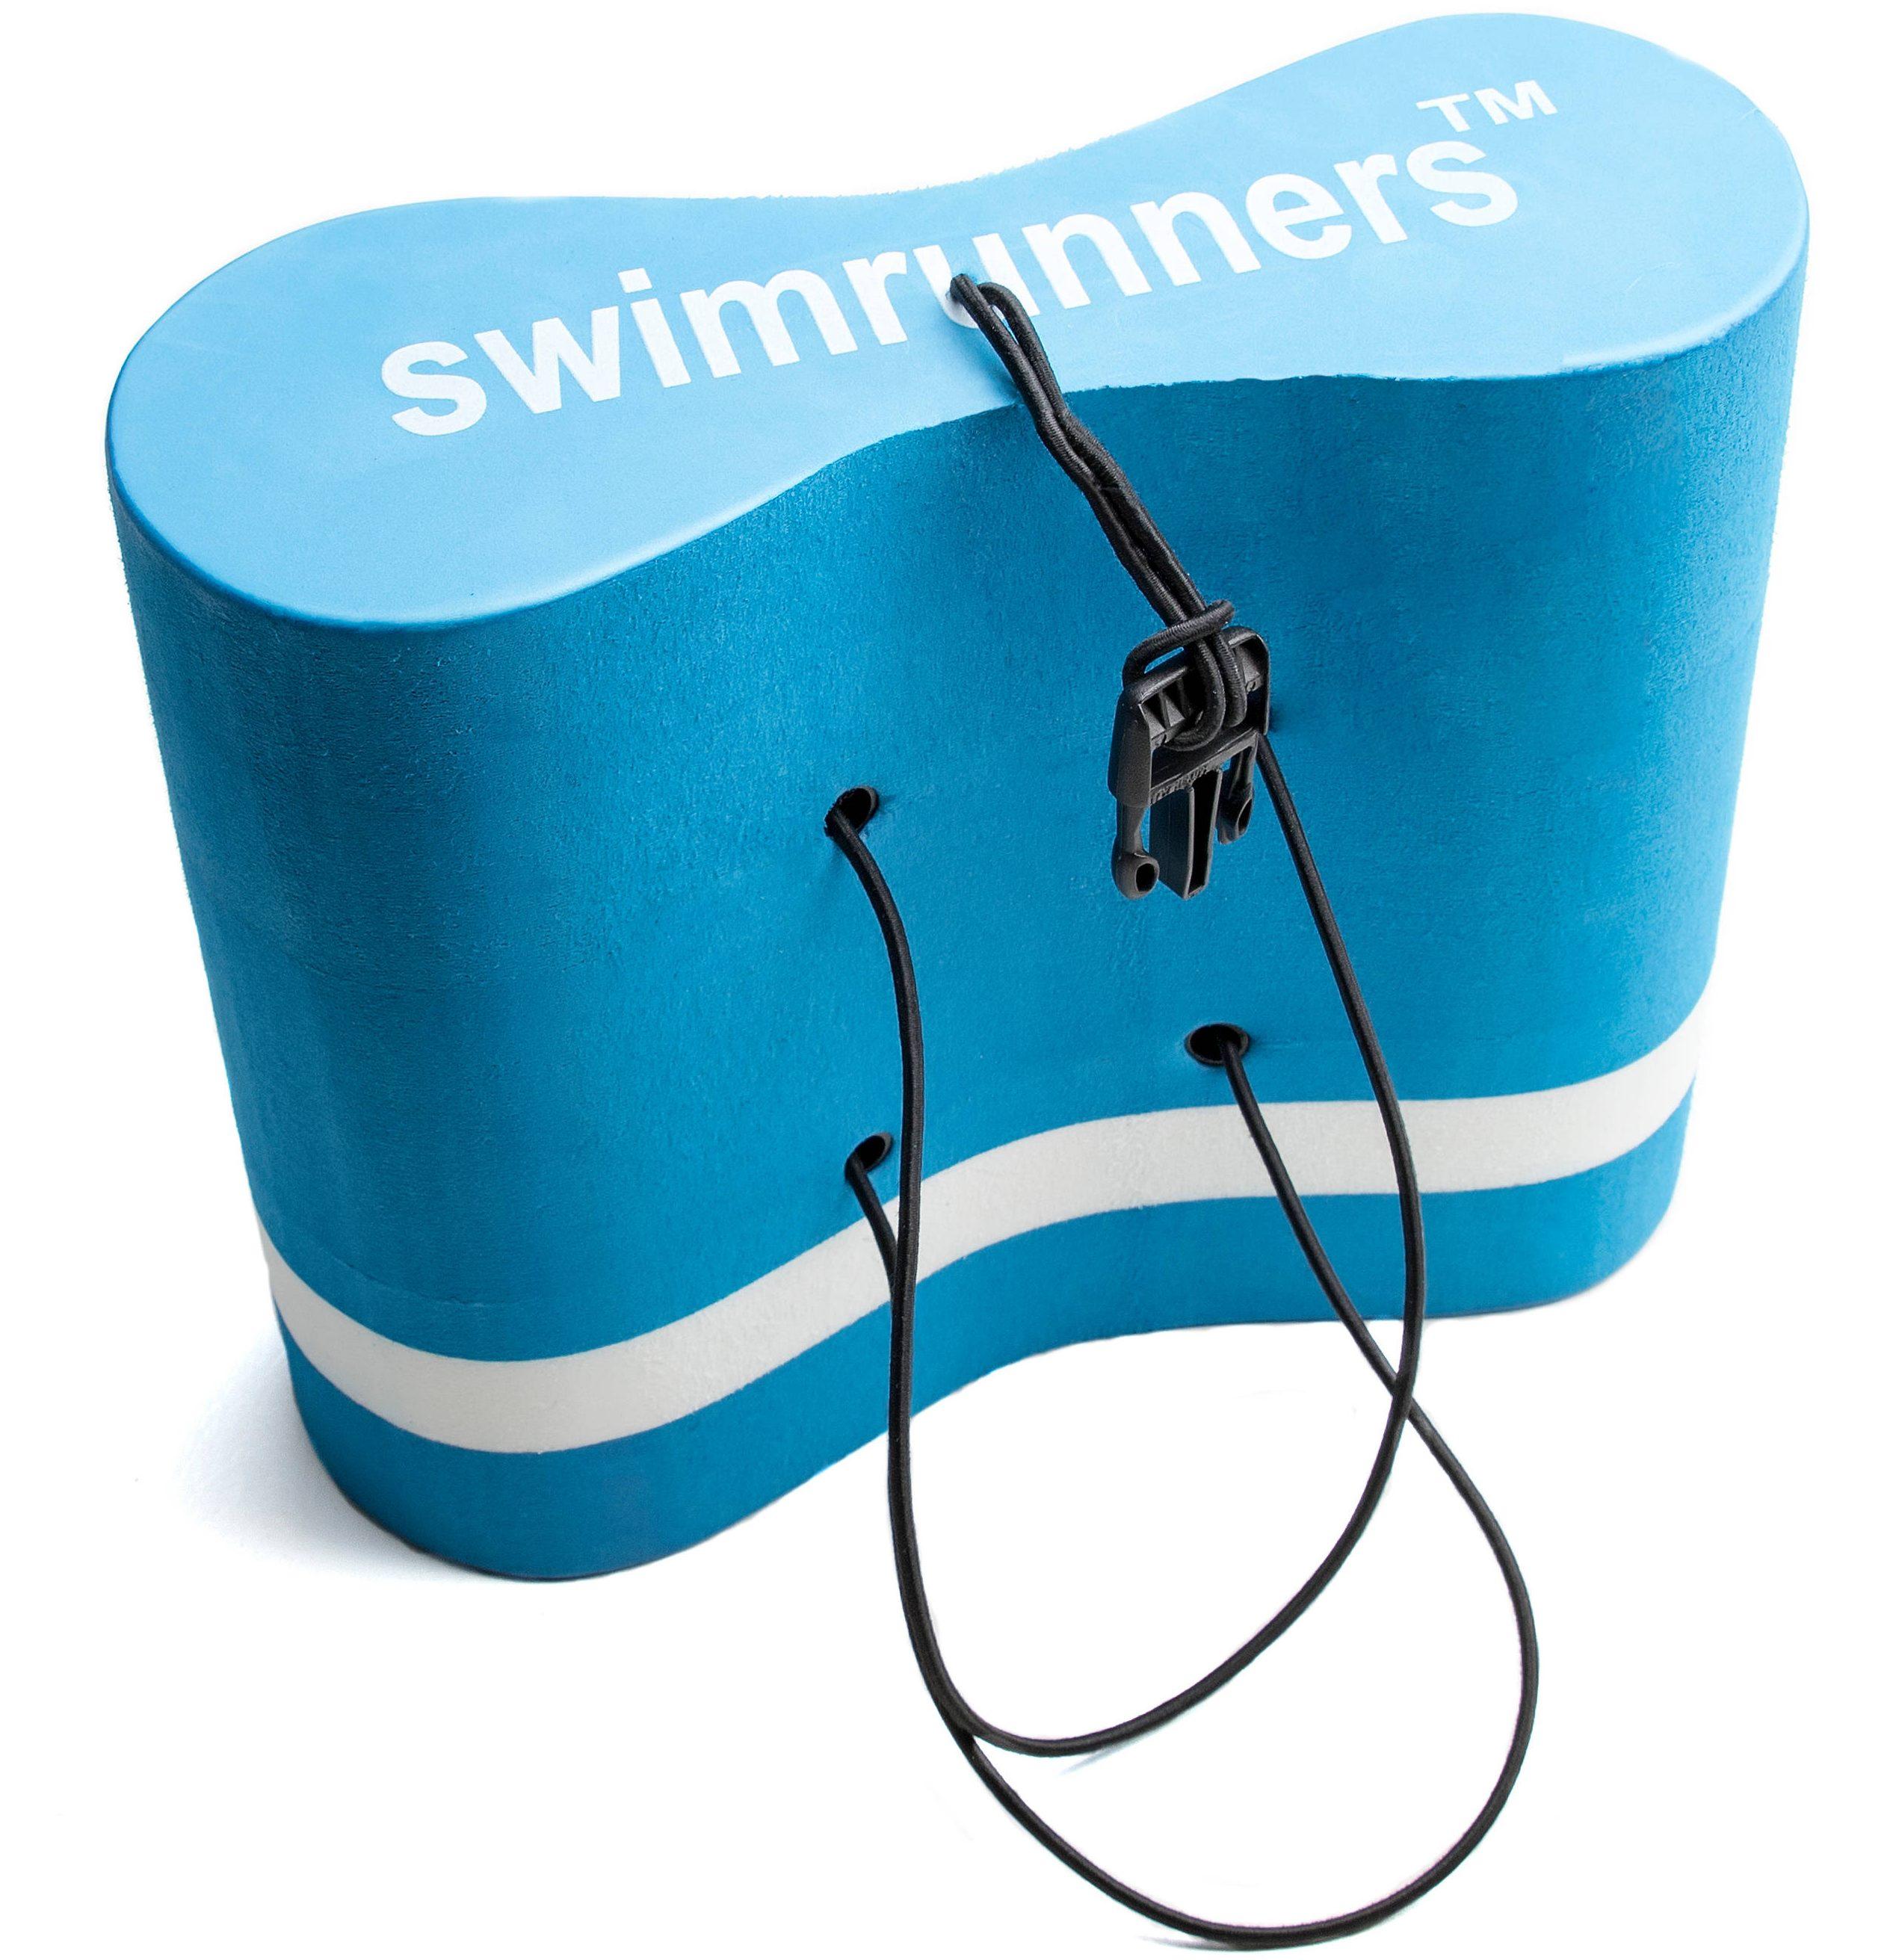 Swimrundolme Swimrunners